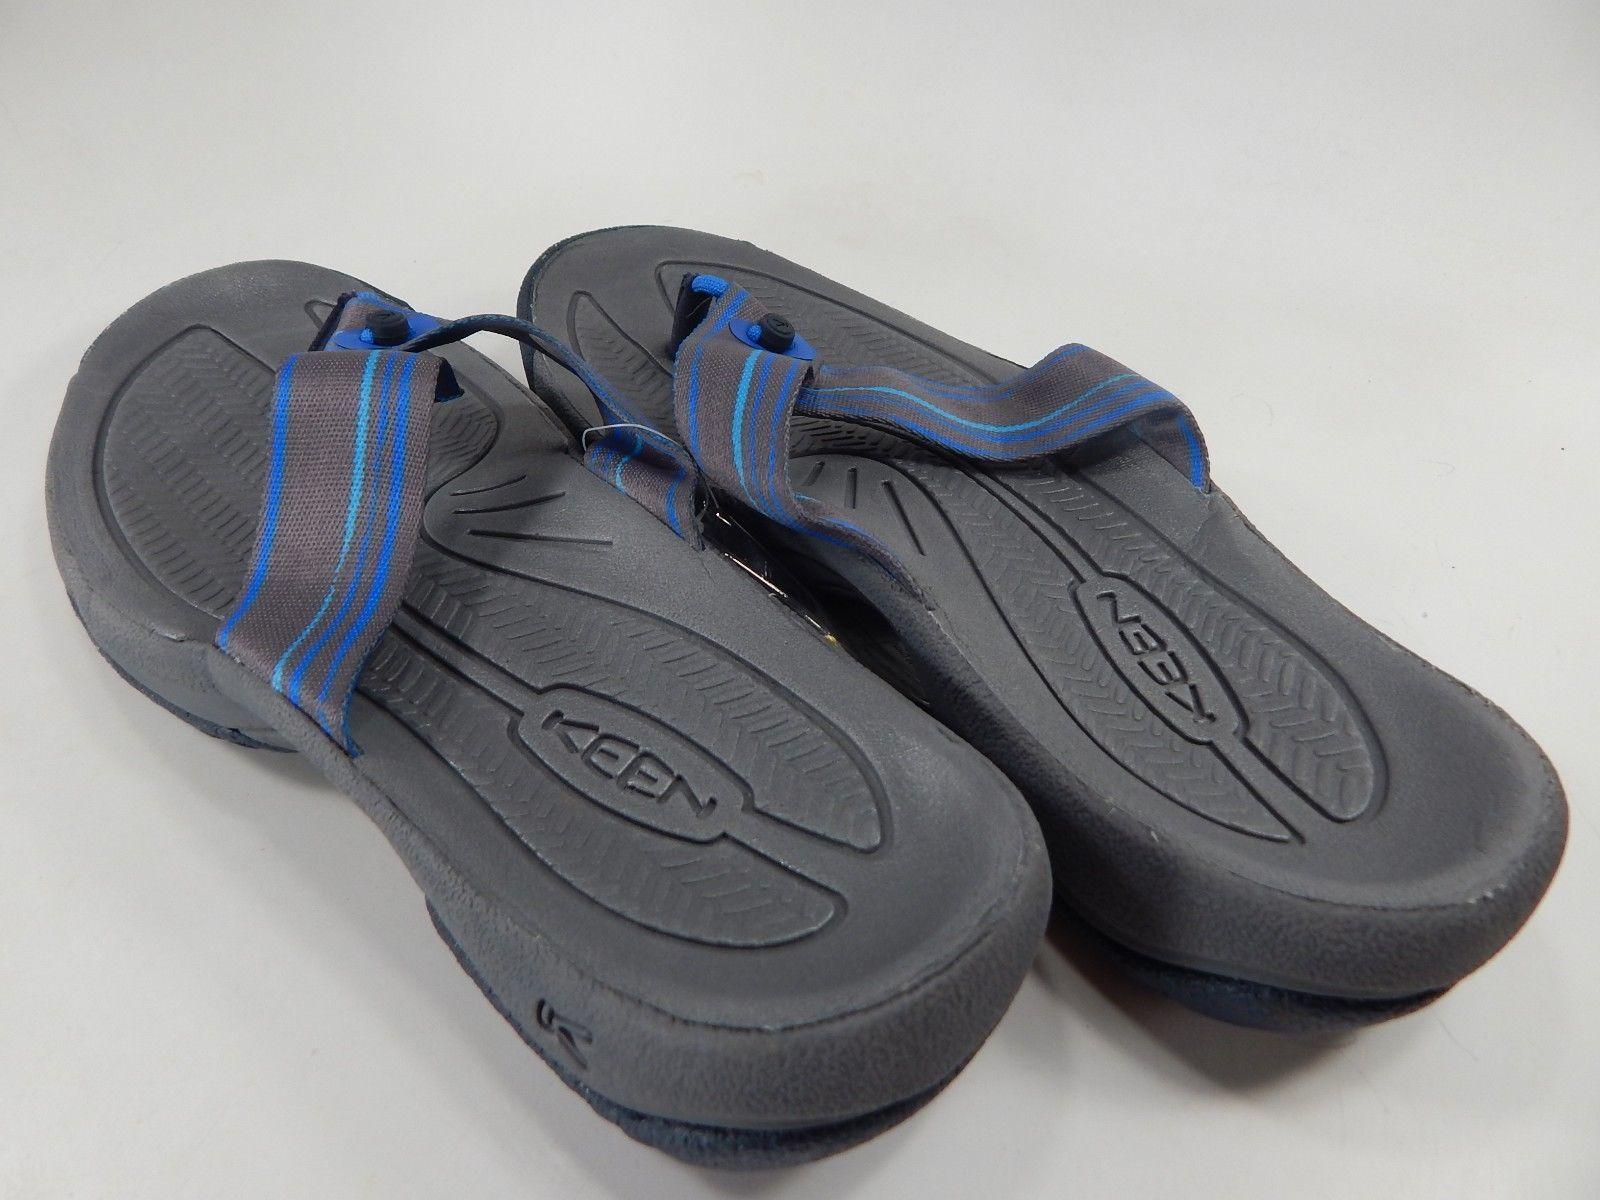 Keen Kona Flip Flop Slip On Sandals Men's Size US 9 M (D) EU 42 Dress Blue/ Gray